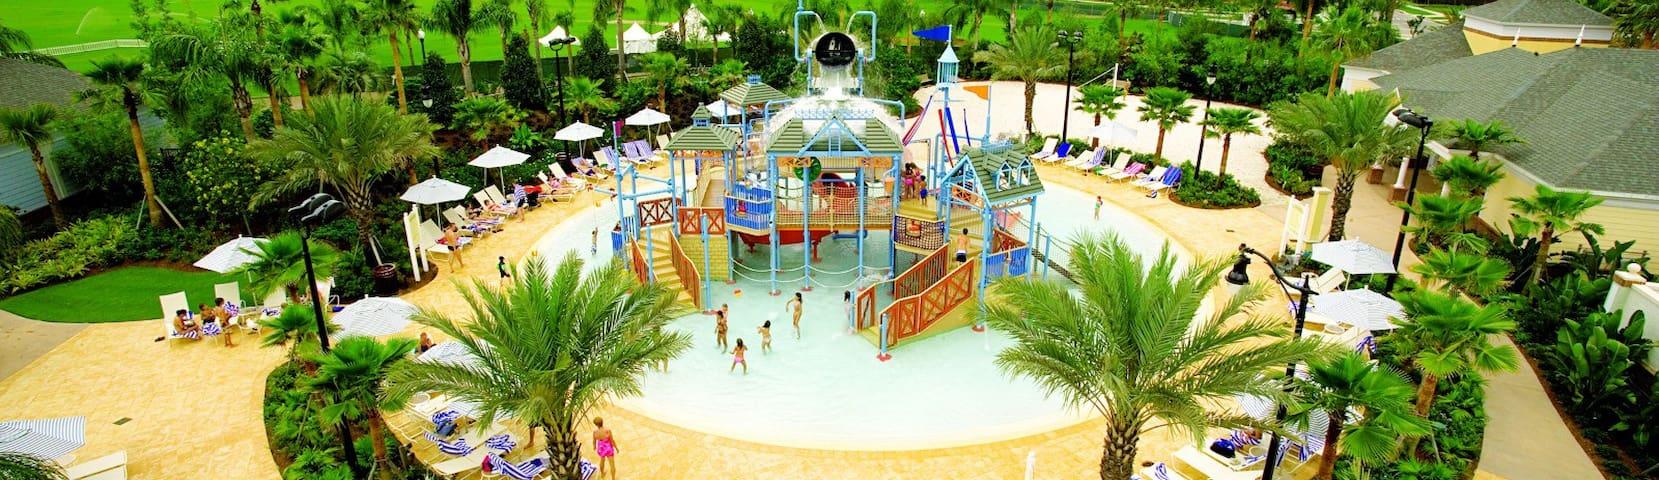 Orlando 3 Bdrm/3 Bath, Luxury Resort w/ Waterpark